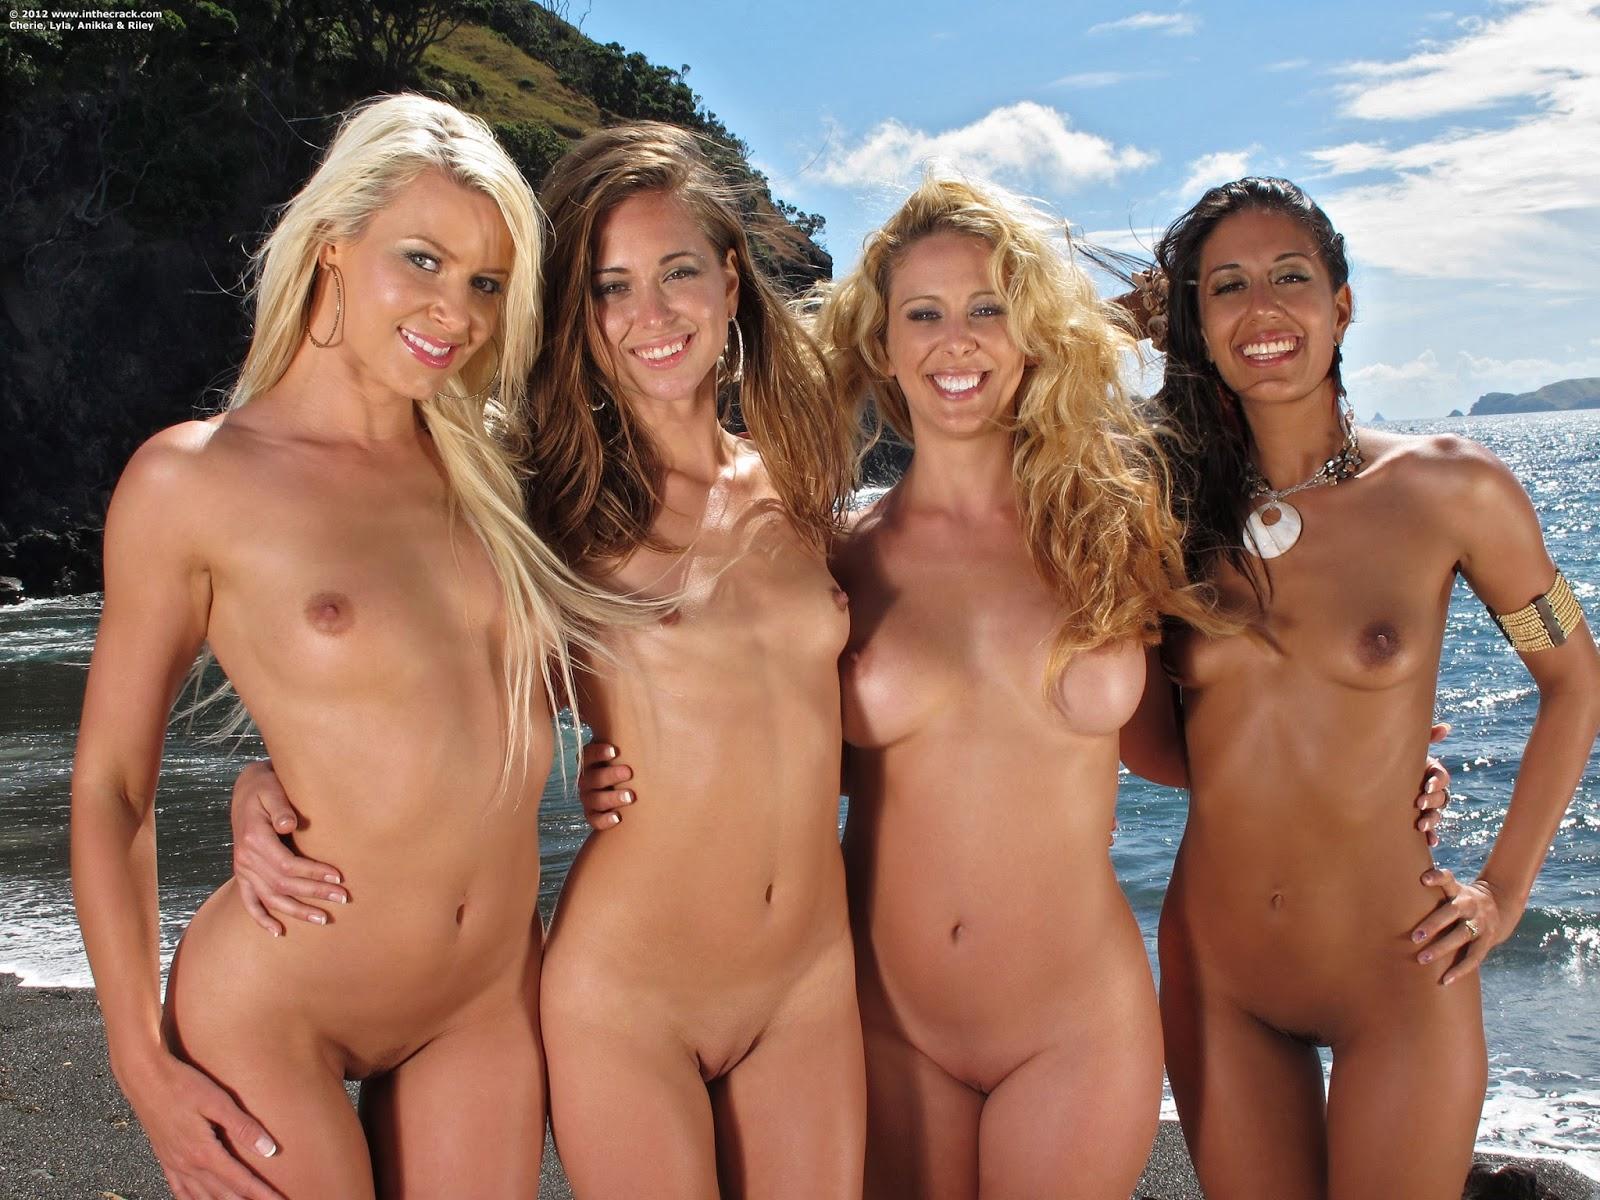 podruzhki-nudistki